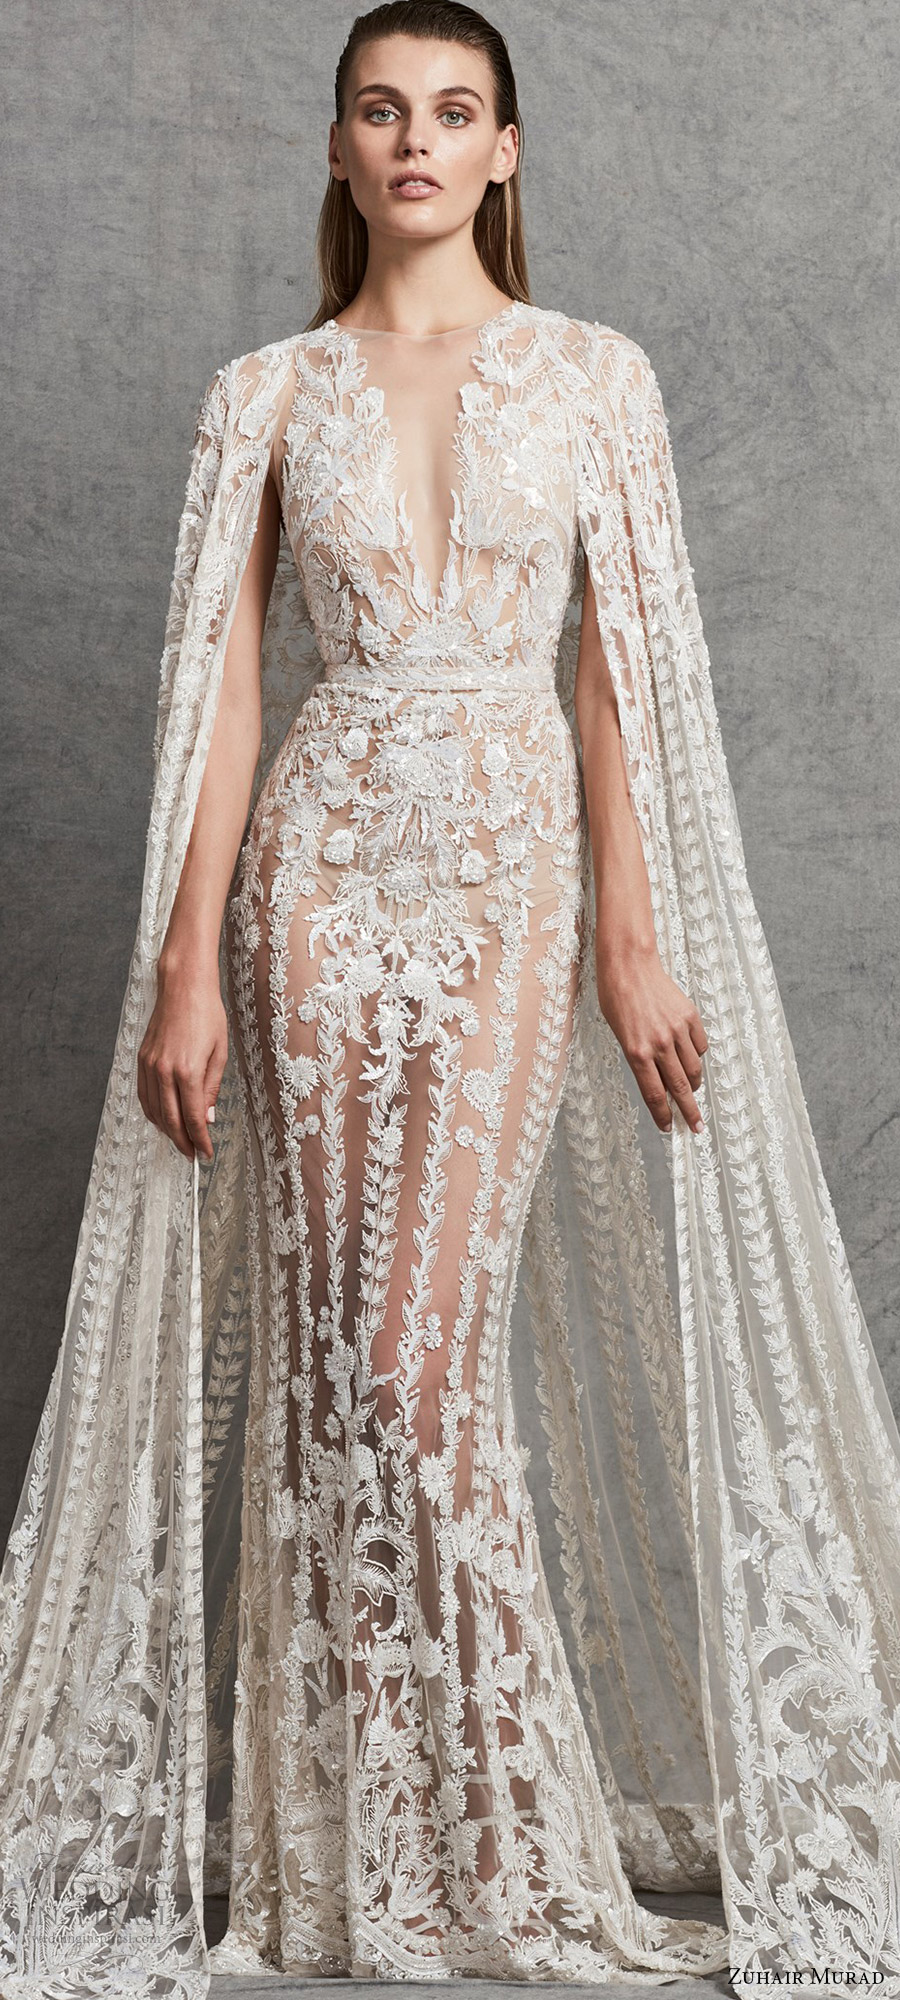 zuhair murad 2018 bridal trends sleeveless deep v neck lace wedding dress (1) mv cape dramatic elegant